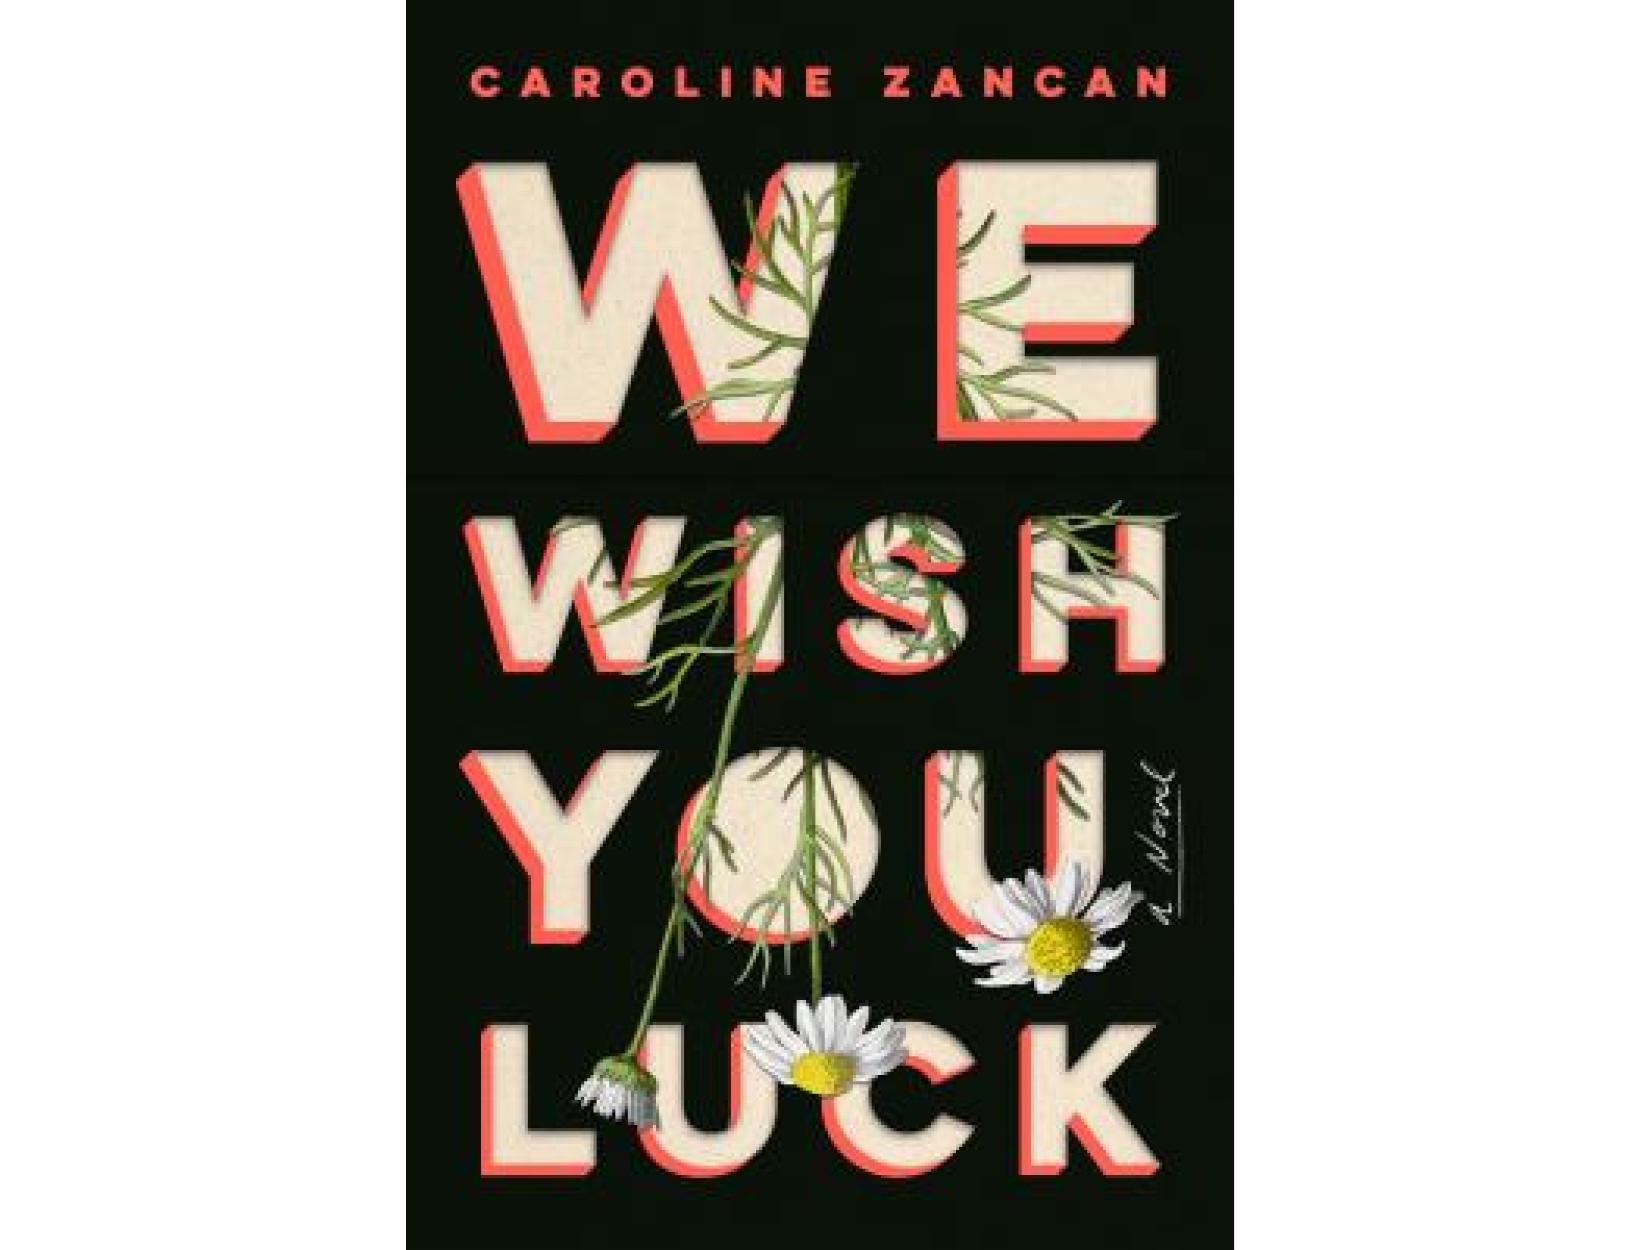 <em>We Wish You Luck</em> by Caroline Zancan